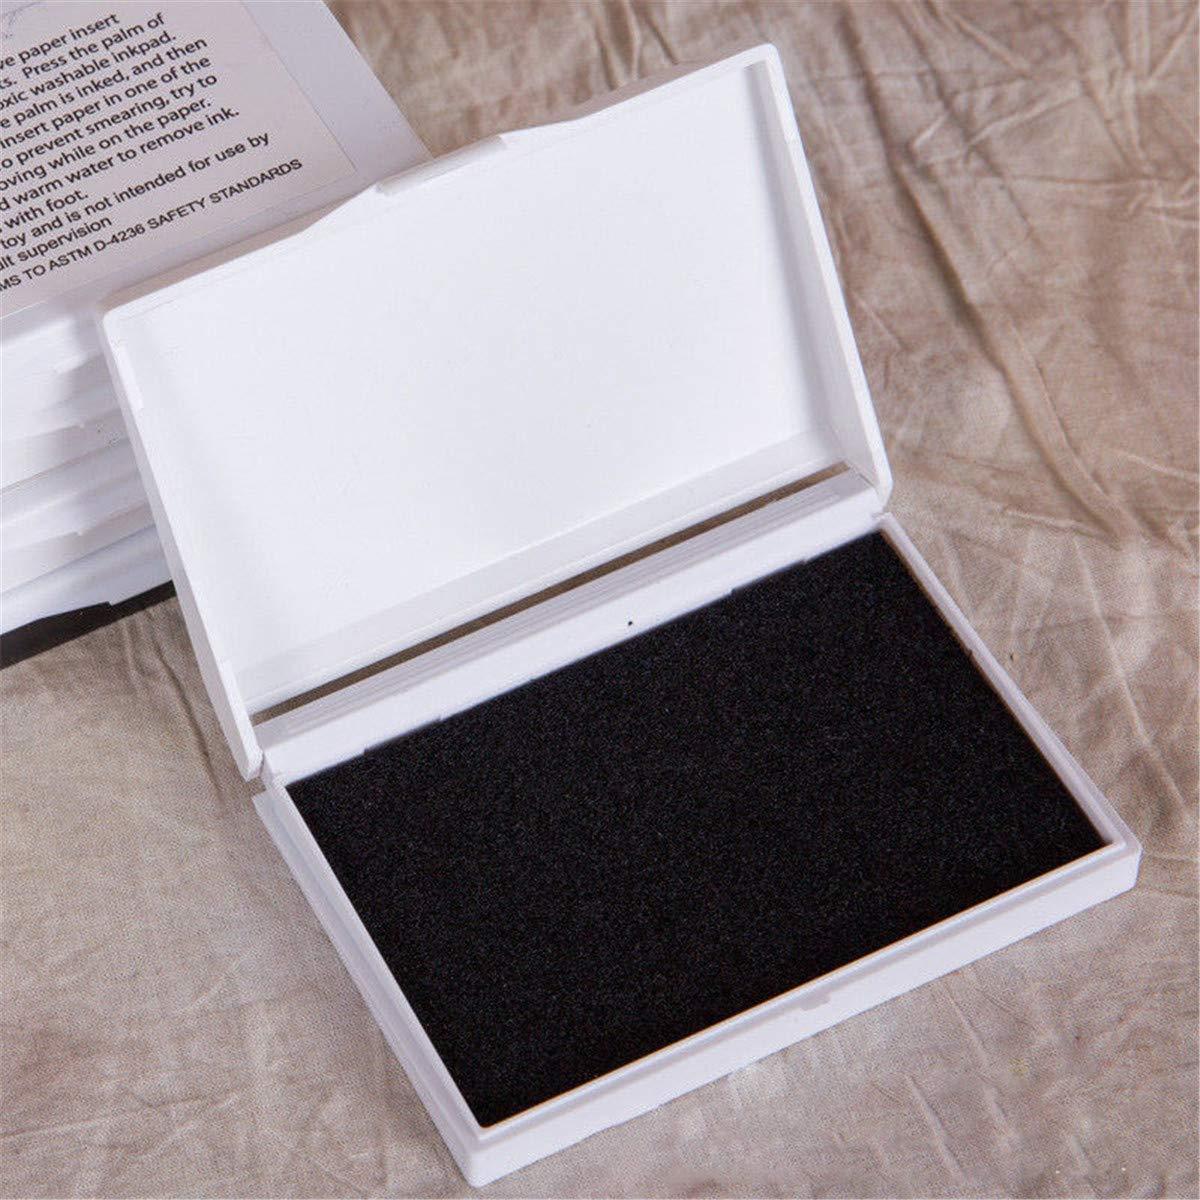 ECYC Baby Handprint Footprint Ink Pads Newborns Paw Print Ink Kits Silver